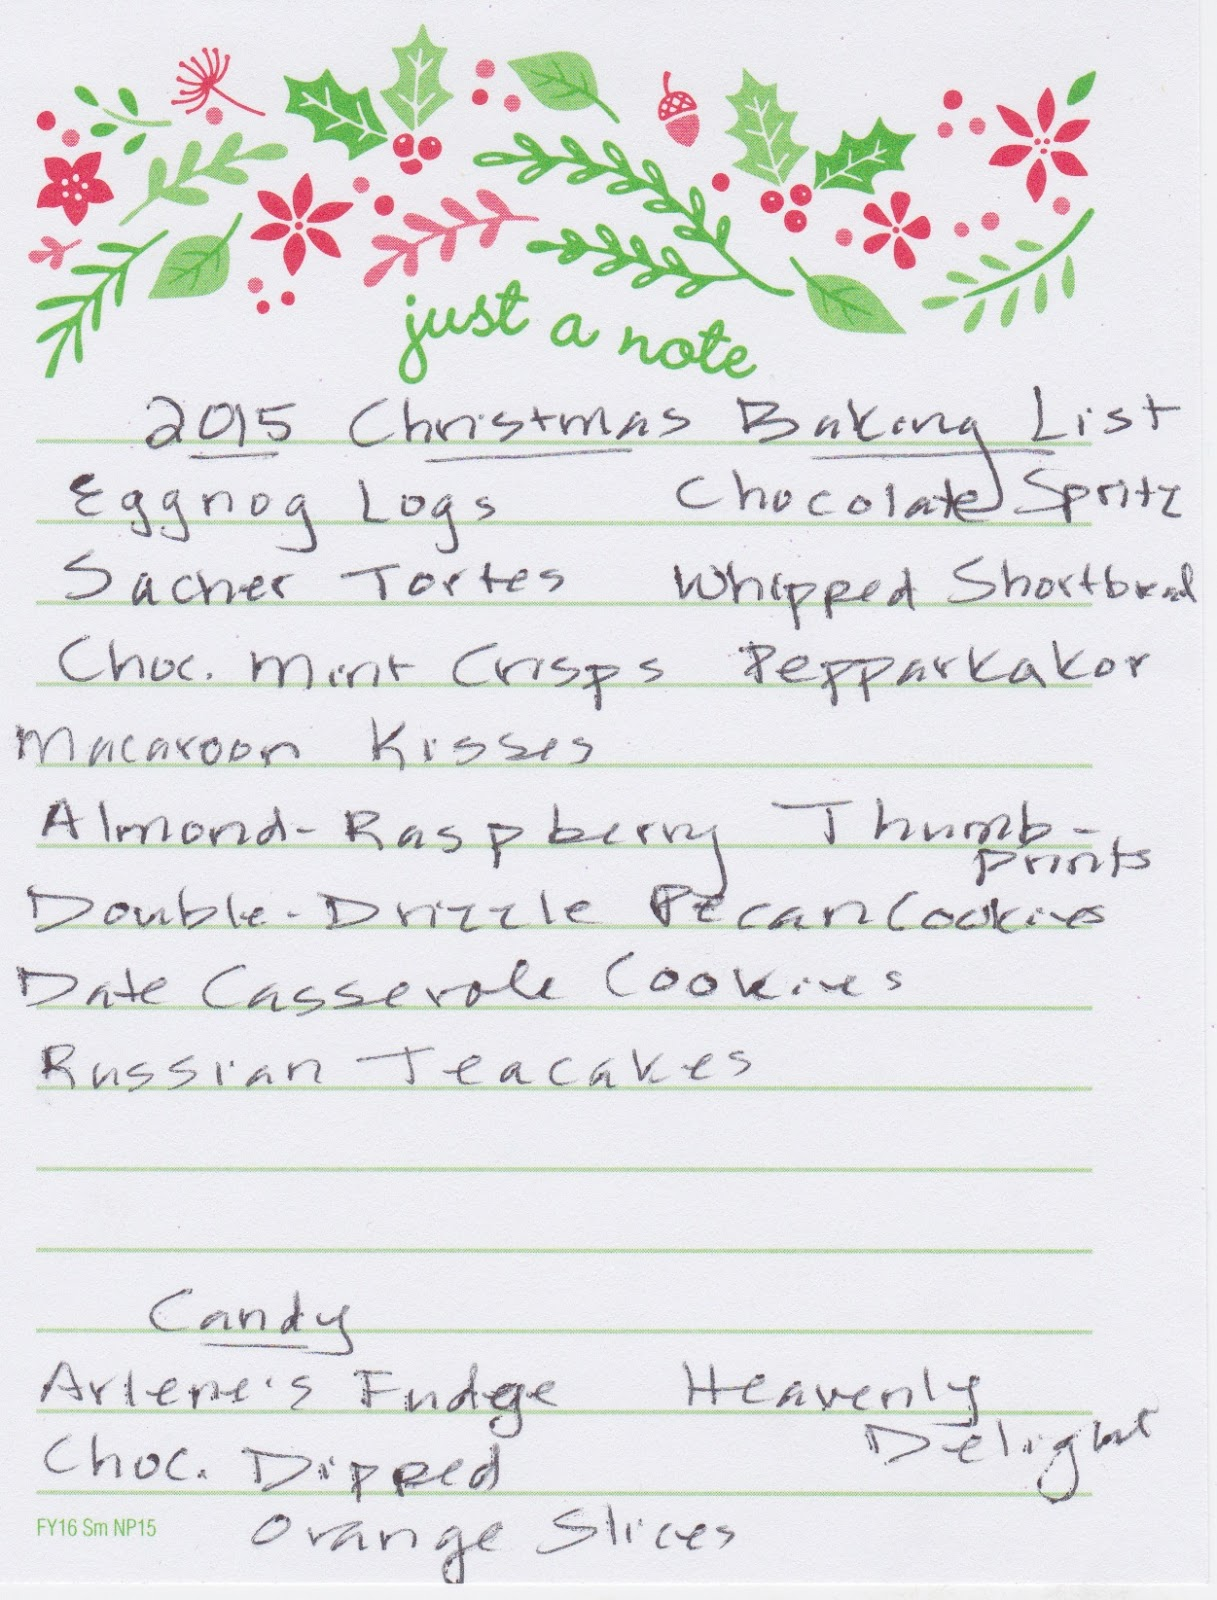 Mrs T S Christmas Kitchen 2015 Baking List